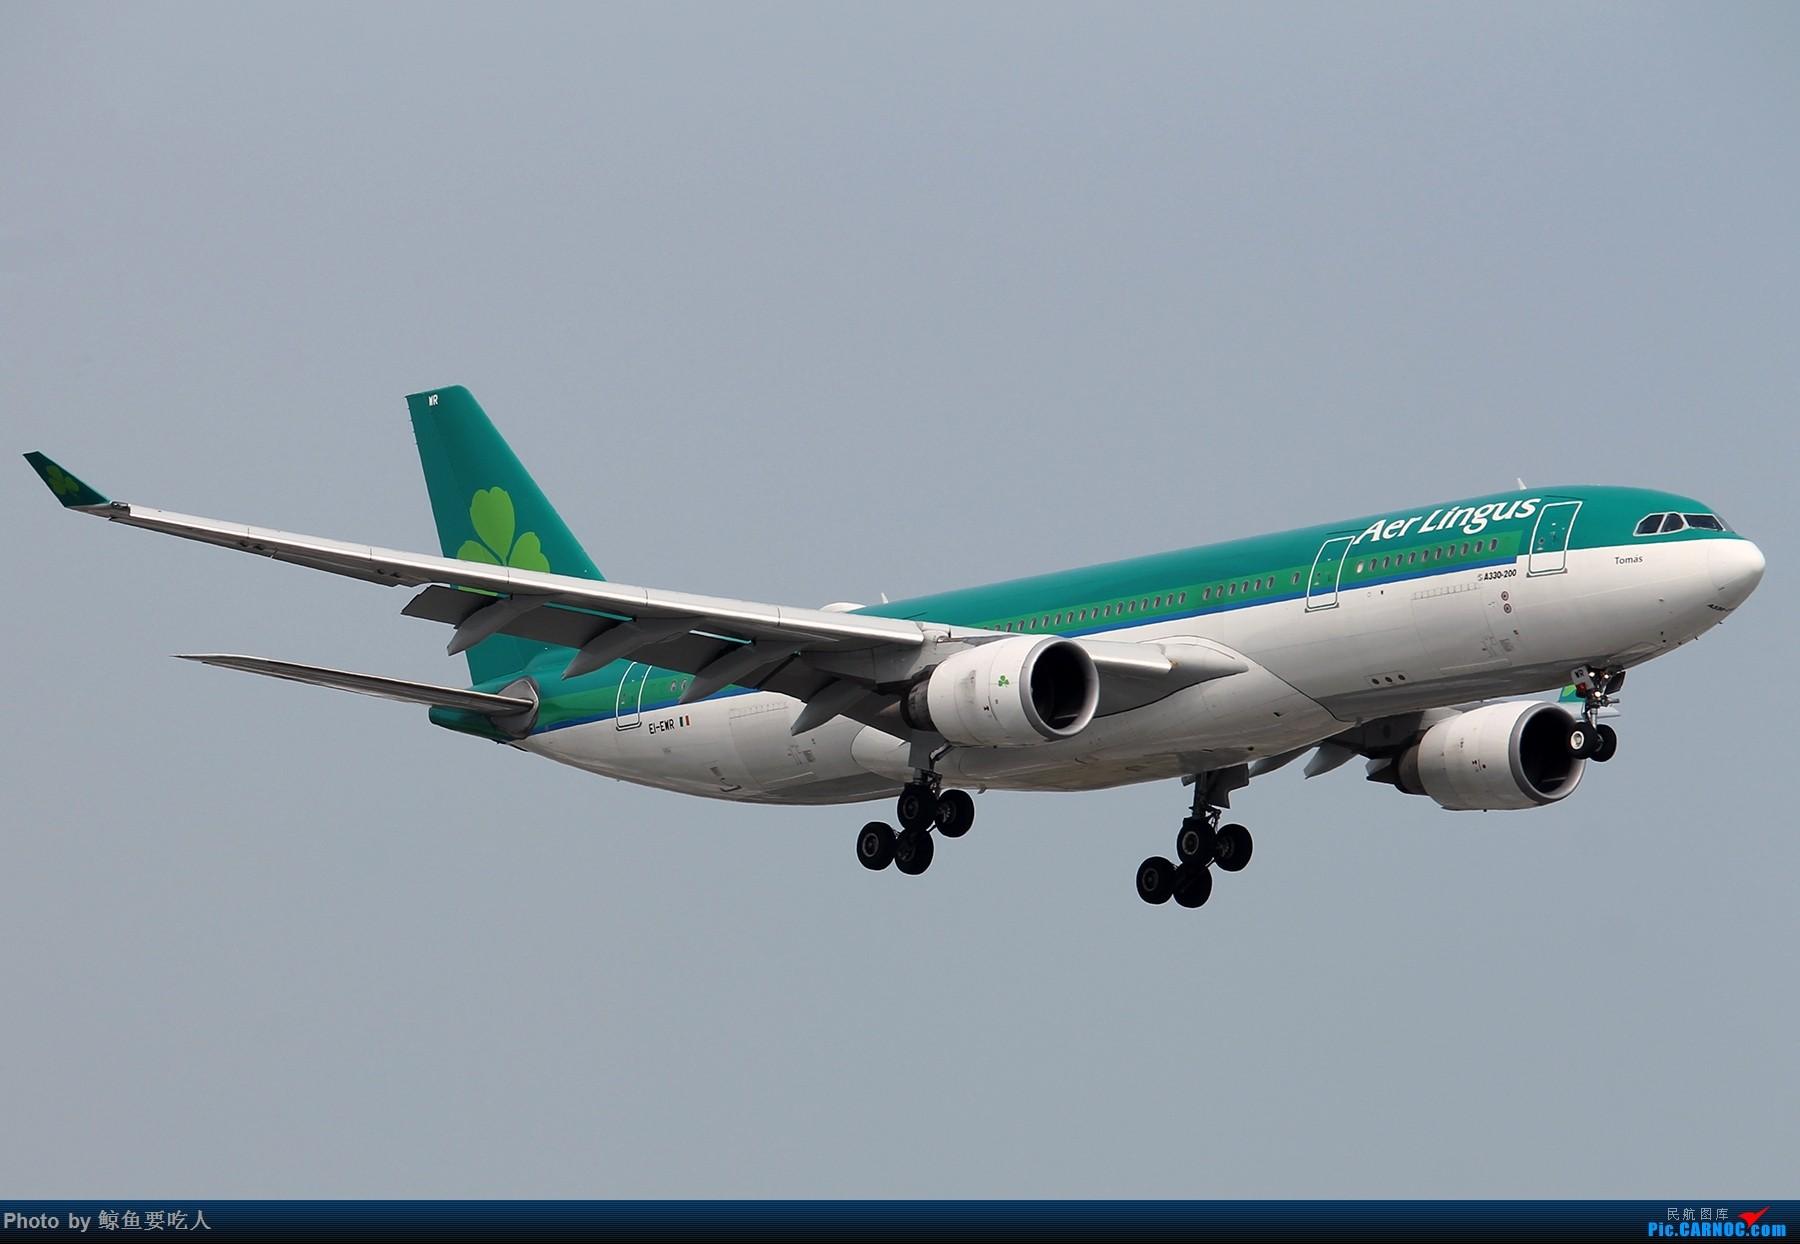 Re:[原创][YYZ] 多伦多皮尔逊国际机场随拍一组~~ AIRBUS A330-300 EI-EMR 多伦多皮尔逊国际机场